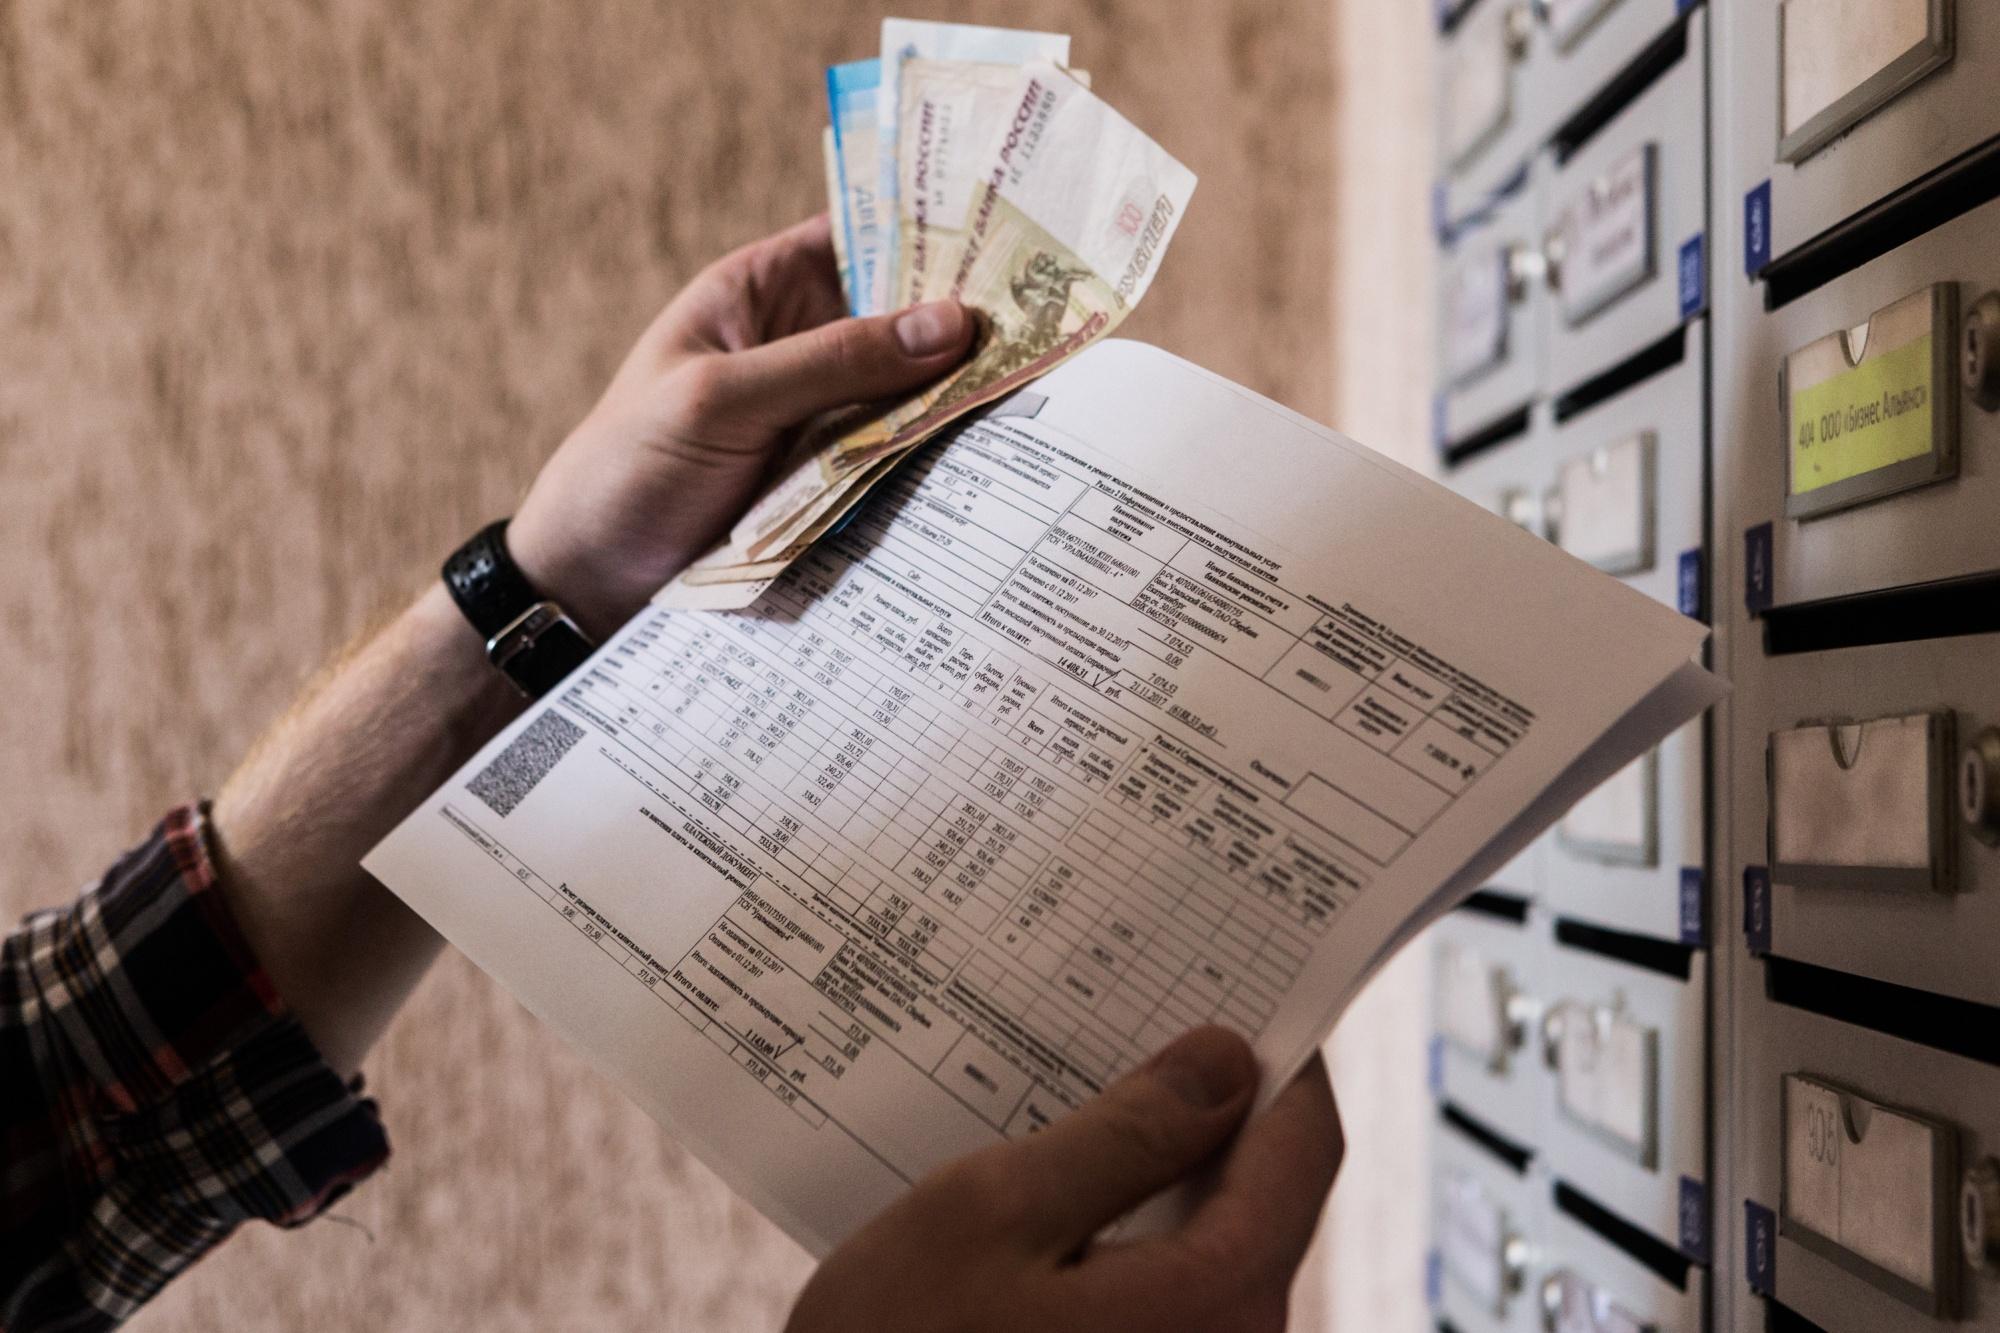 В Госдуме пообещали россиянам, что резкого роста тарифом на ЖКХ не будет